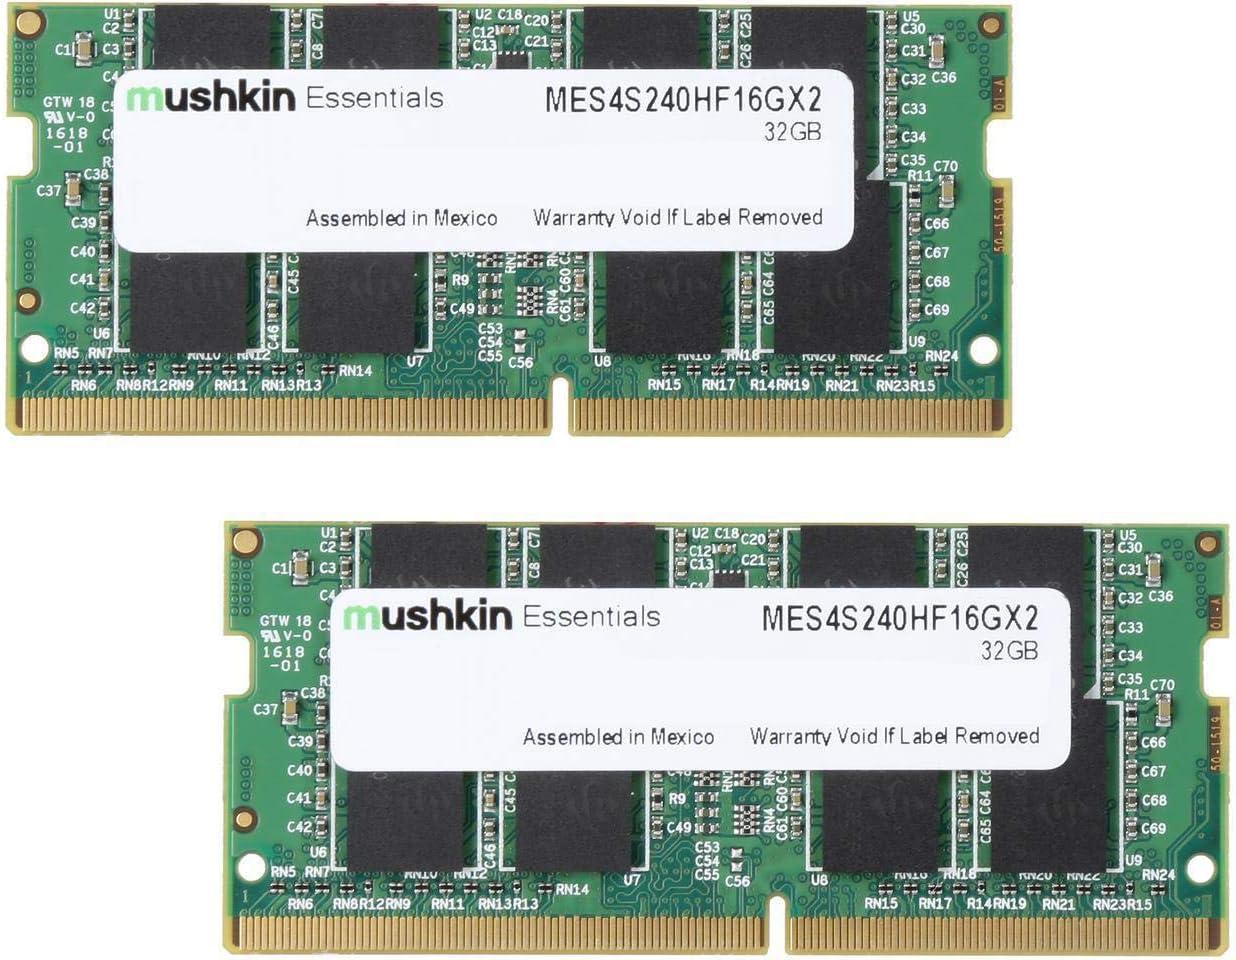 Mushkin Essentials – DDR4 Laptop DRAM – 32GB (2x16GB) SODIMM Memory Kit – 2400MHz (PC4-19200) CL-17 – 260-pin 1.2V Notebook RAM – Dual-Channel – Low-Voltage – (MES4S240HF16GX2)